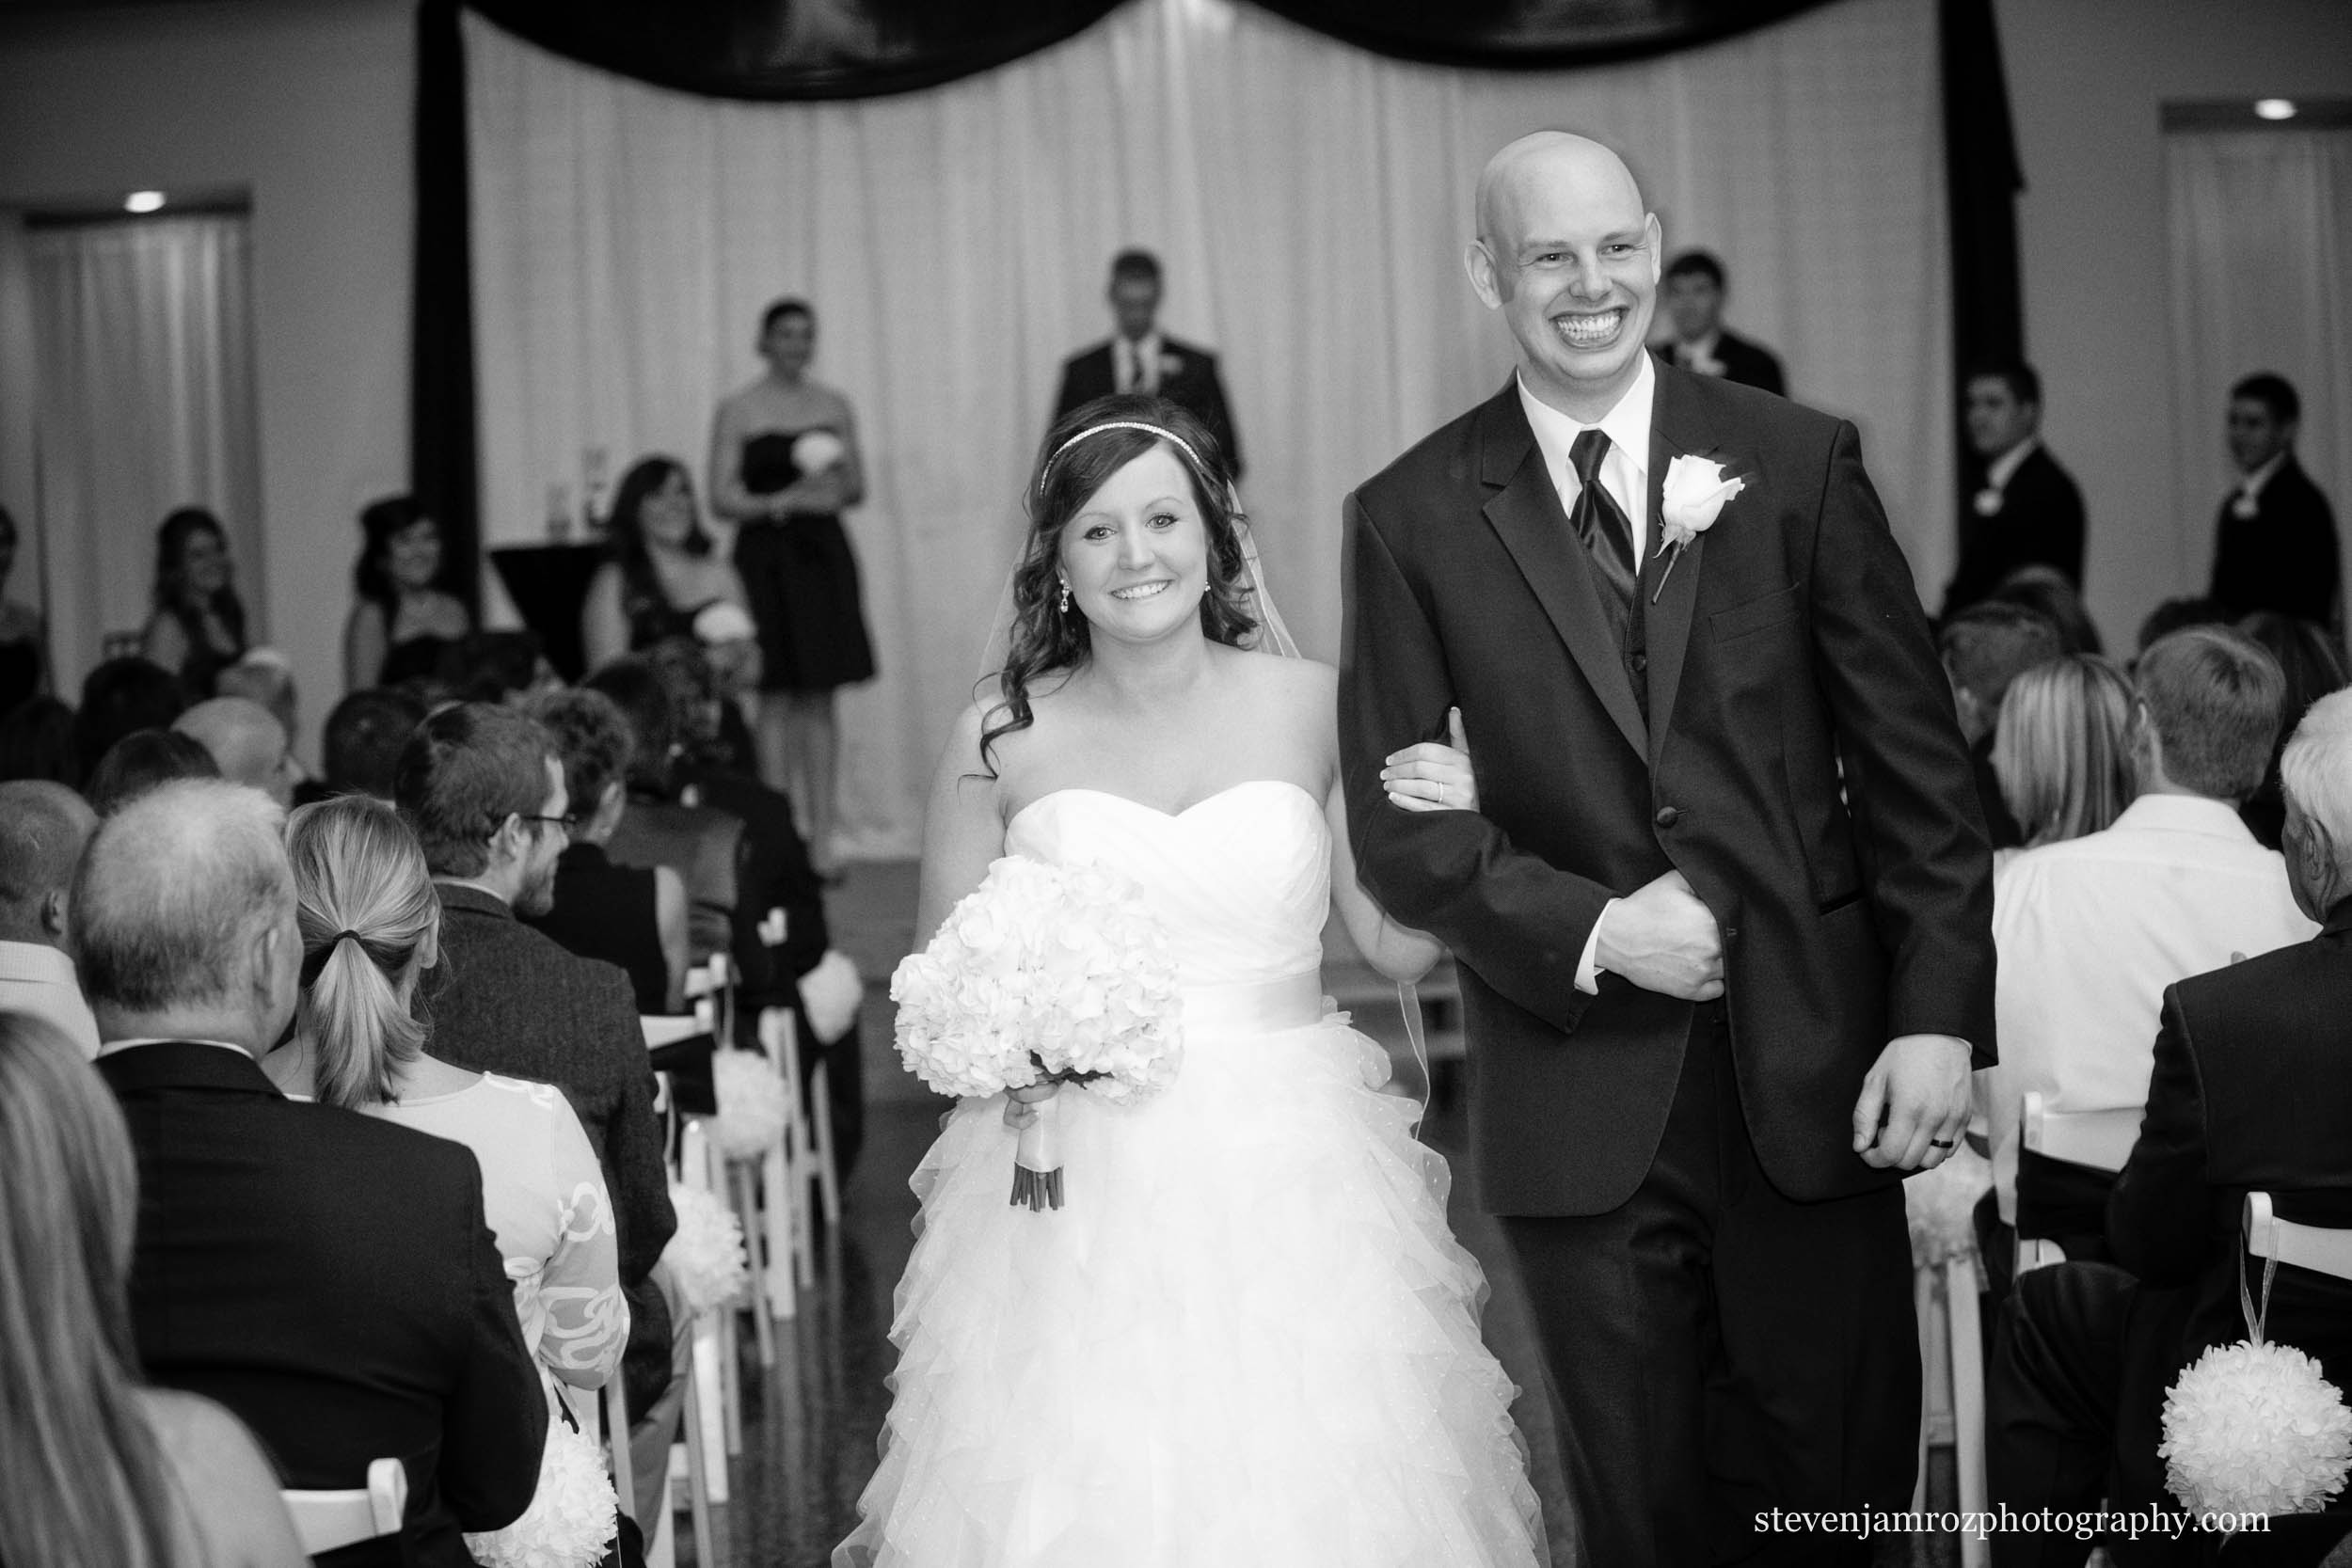 i-do-wedding-shrine-club-raleigh-steven-jamroz-0696.jpg